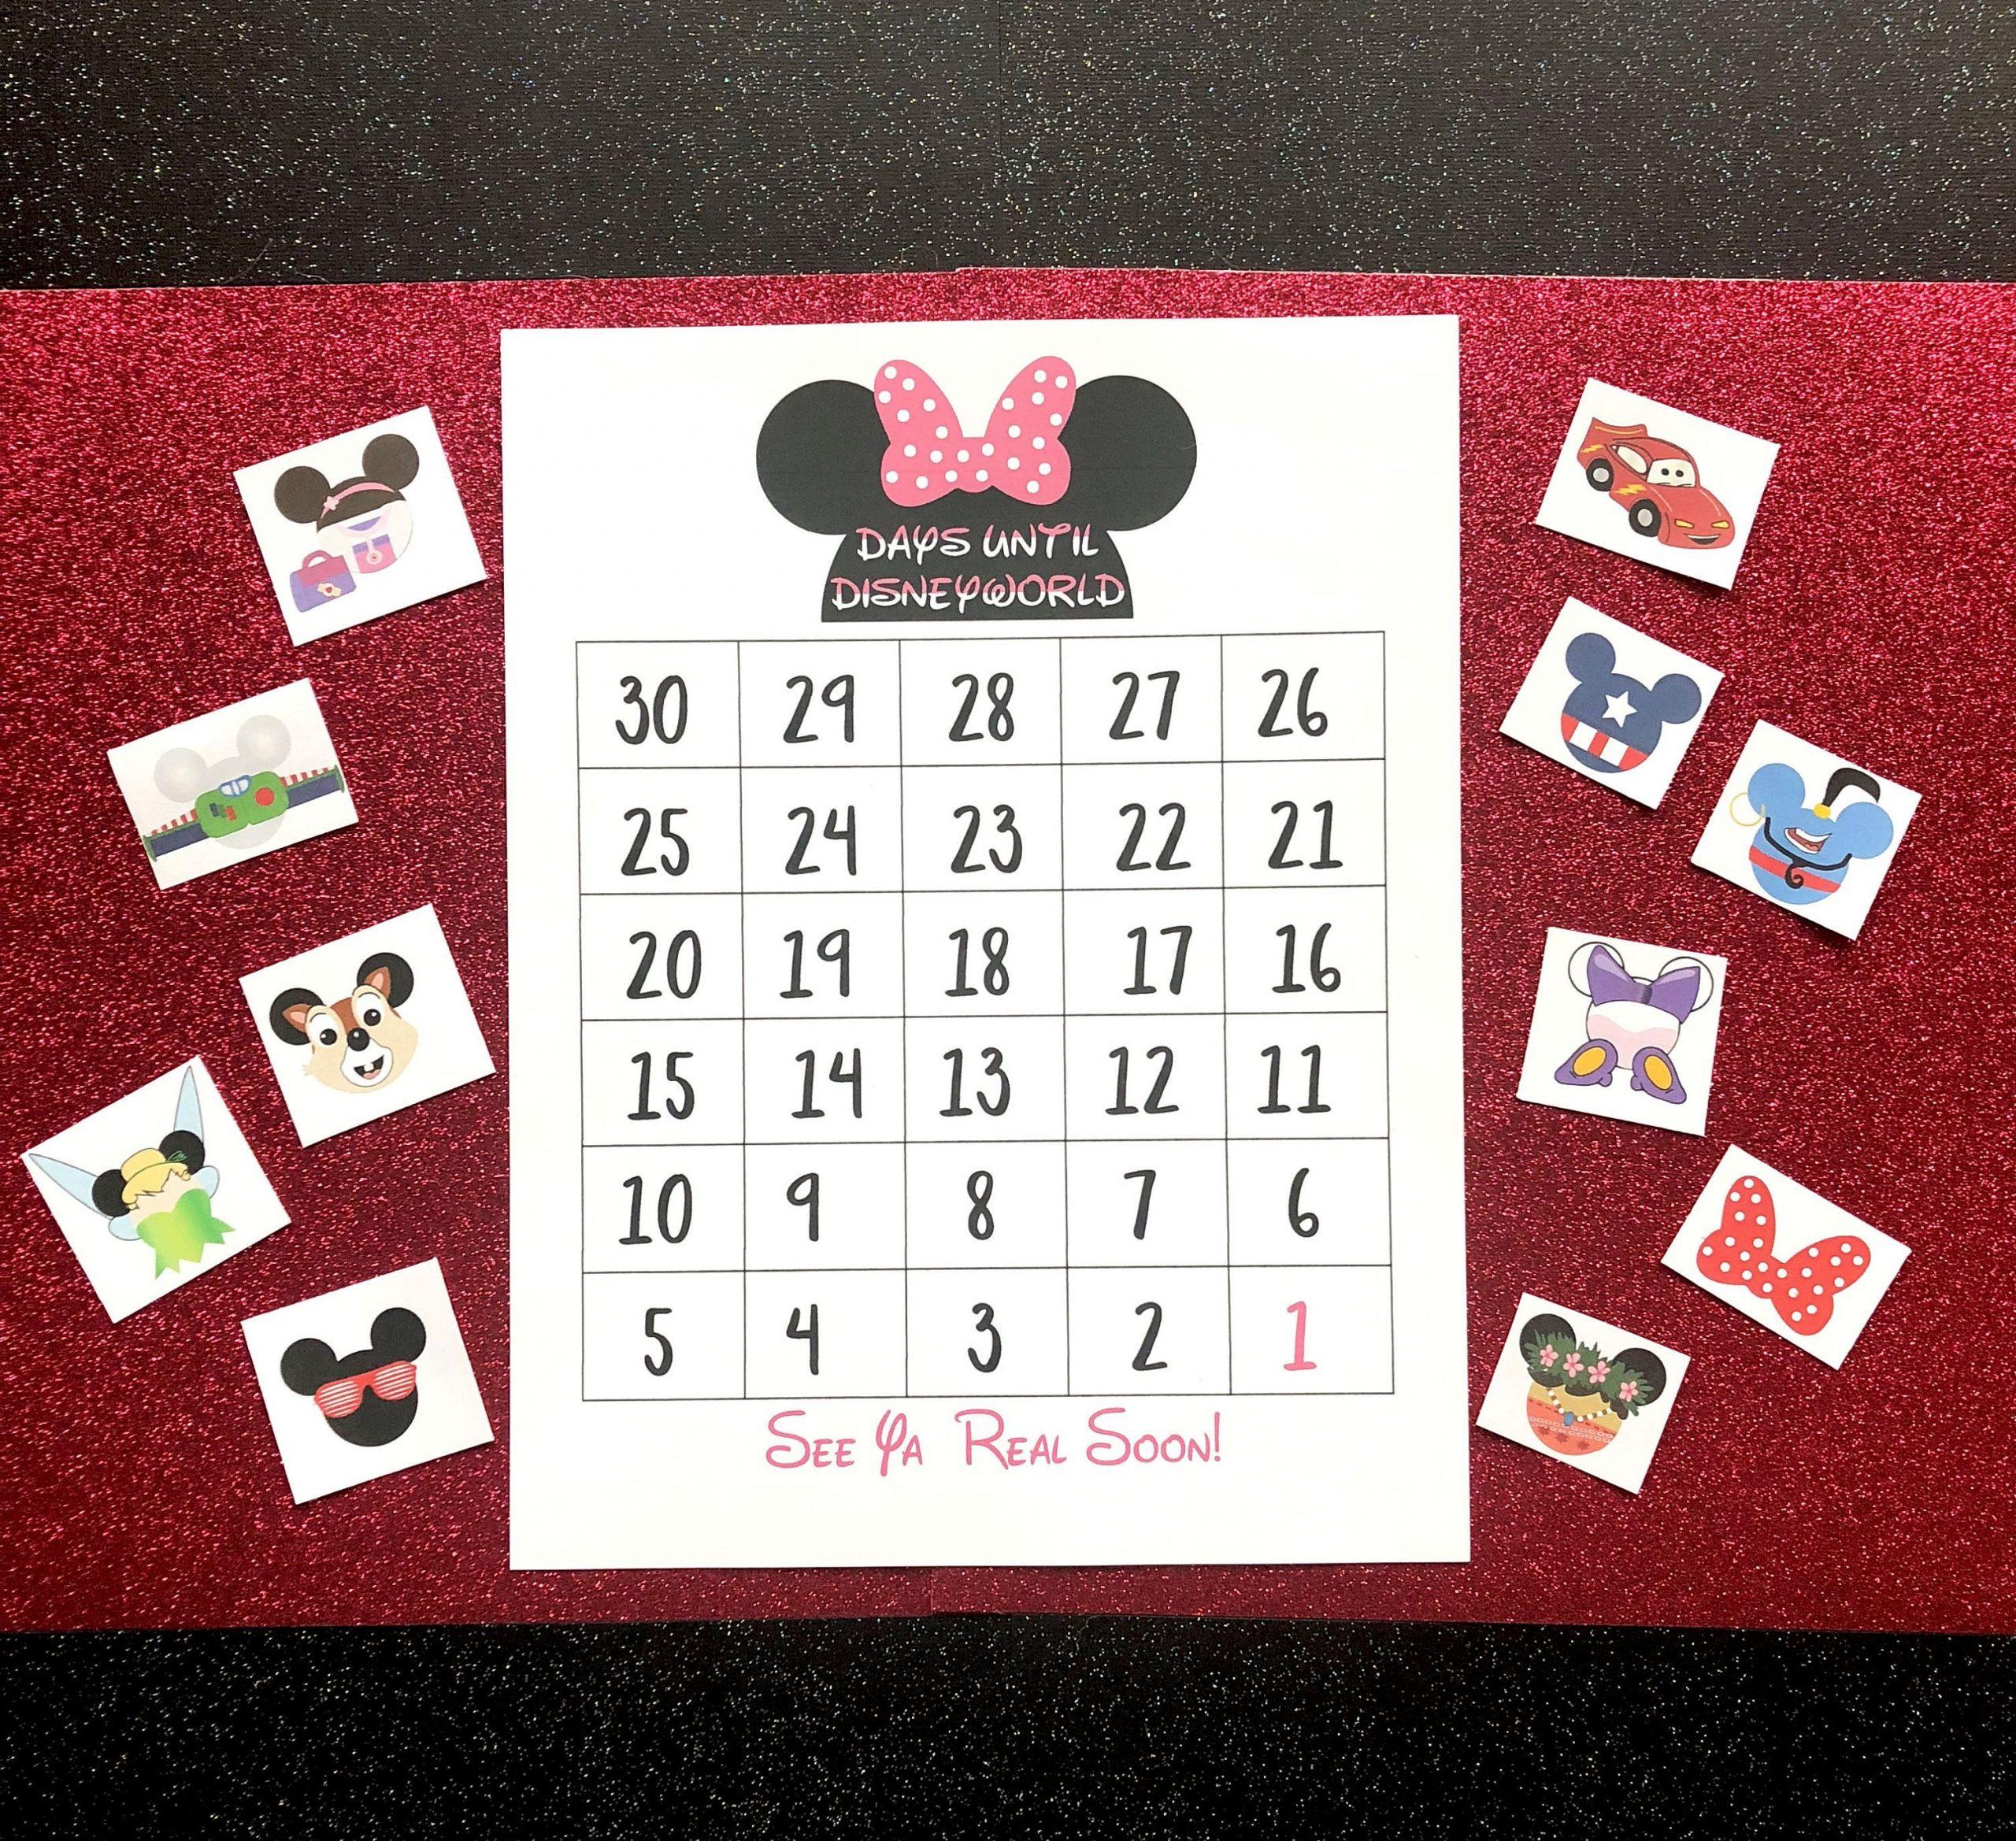 Disney, Disney World, Disneyland, Disney Cruise, Disney 365 Day Electronic Countdown Calendar